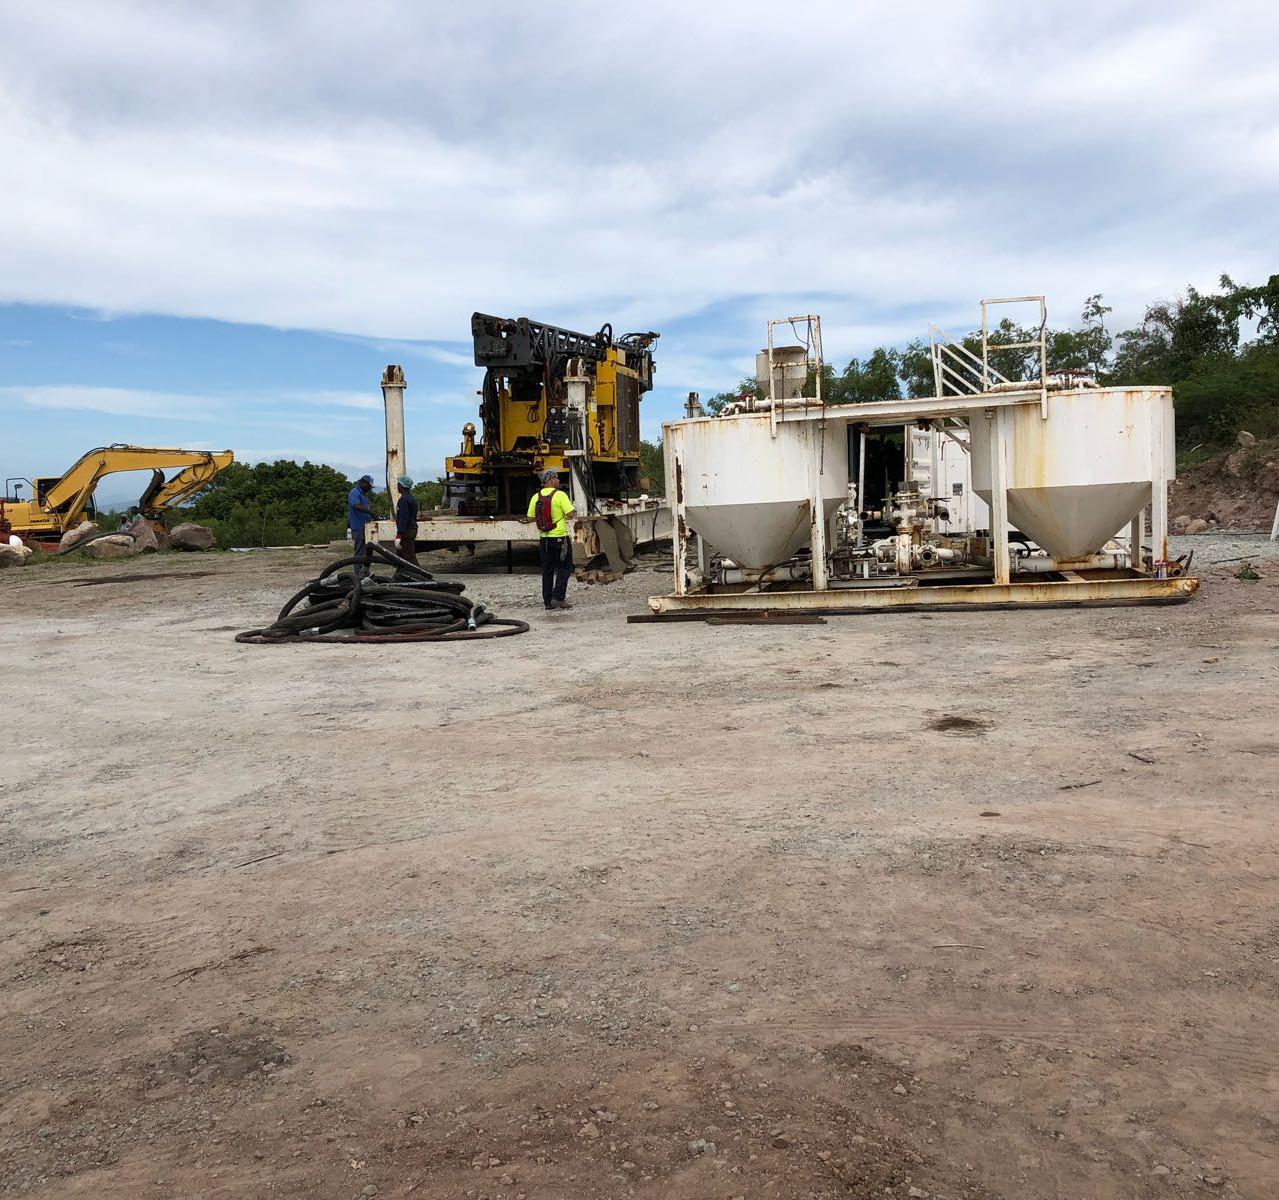 Nevis Rig w Mud Mixing Preparation